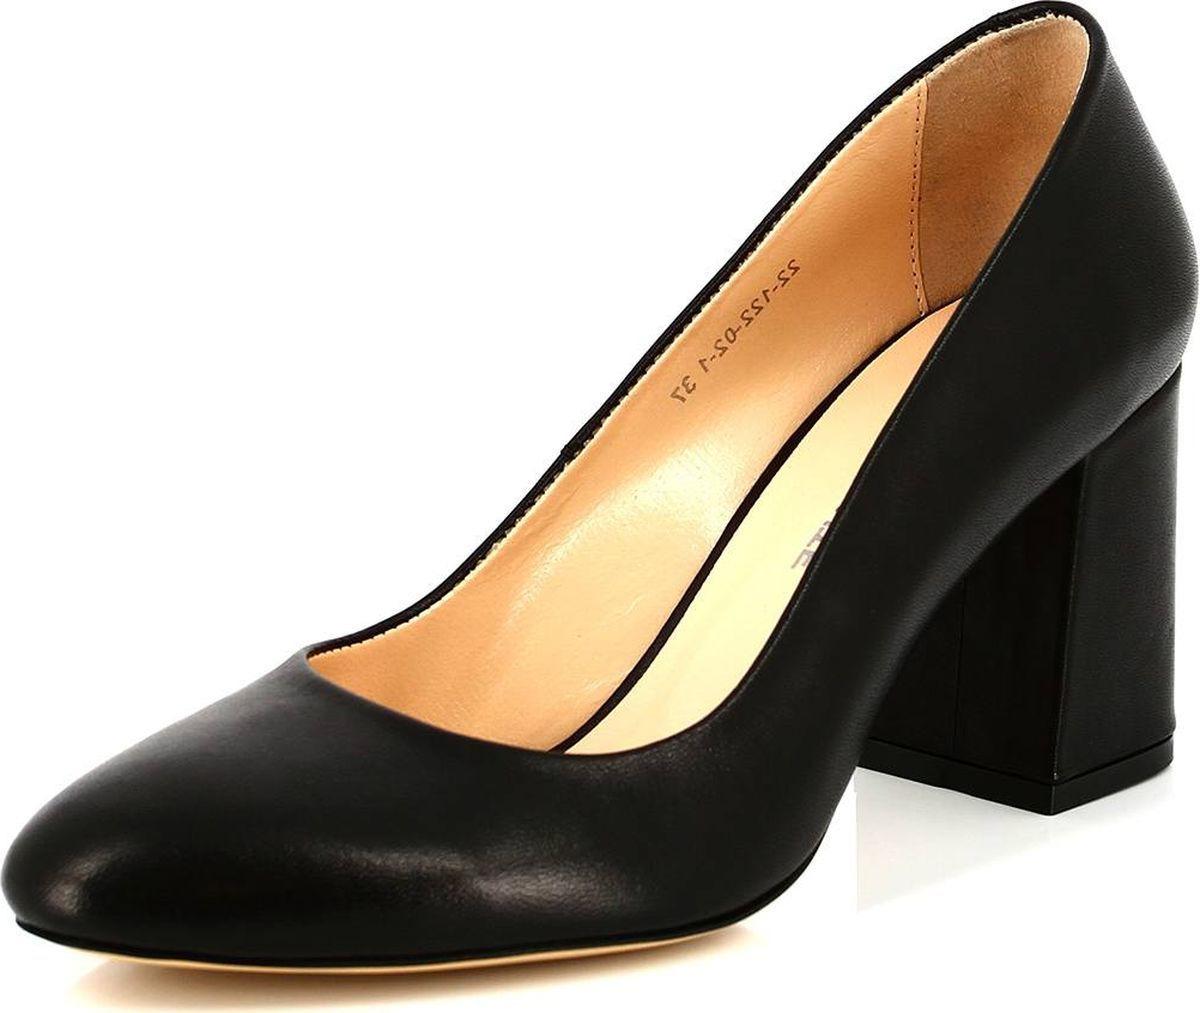 Туфли Paolo Conte туфли женские paolo conte цвет черный b1 124 12 2 размер 35